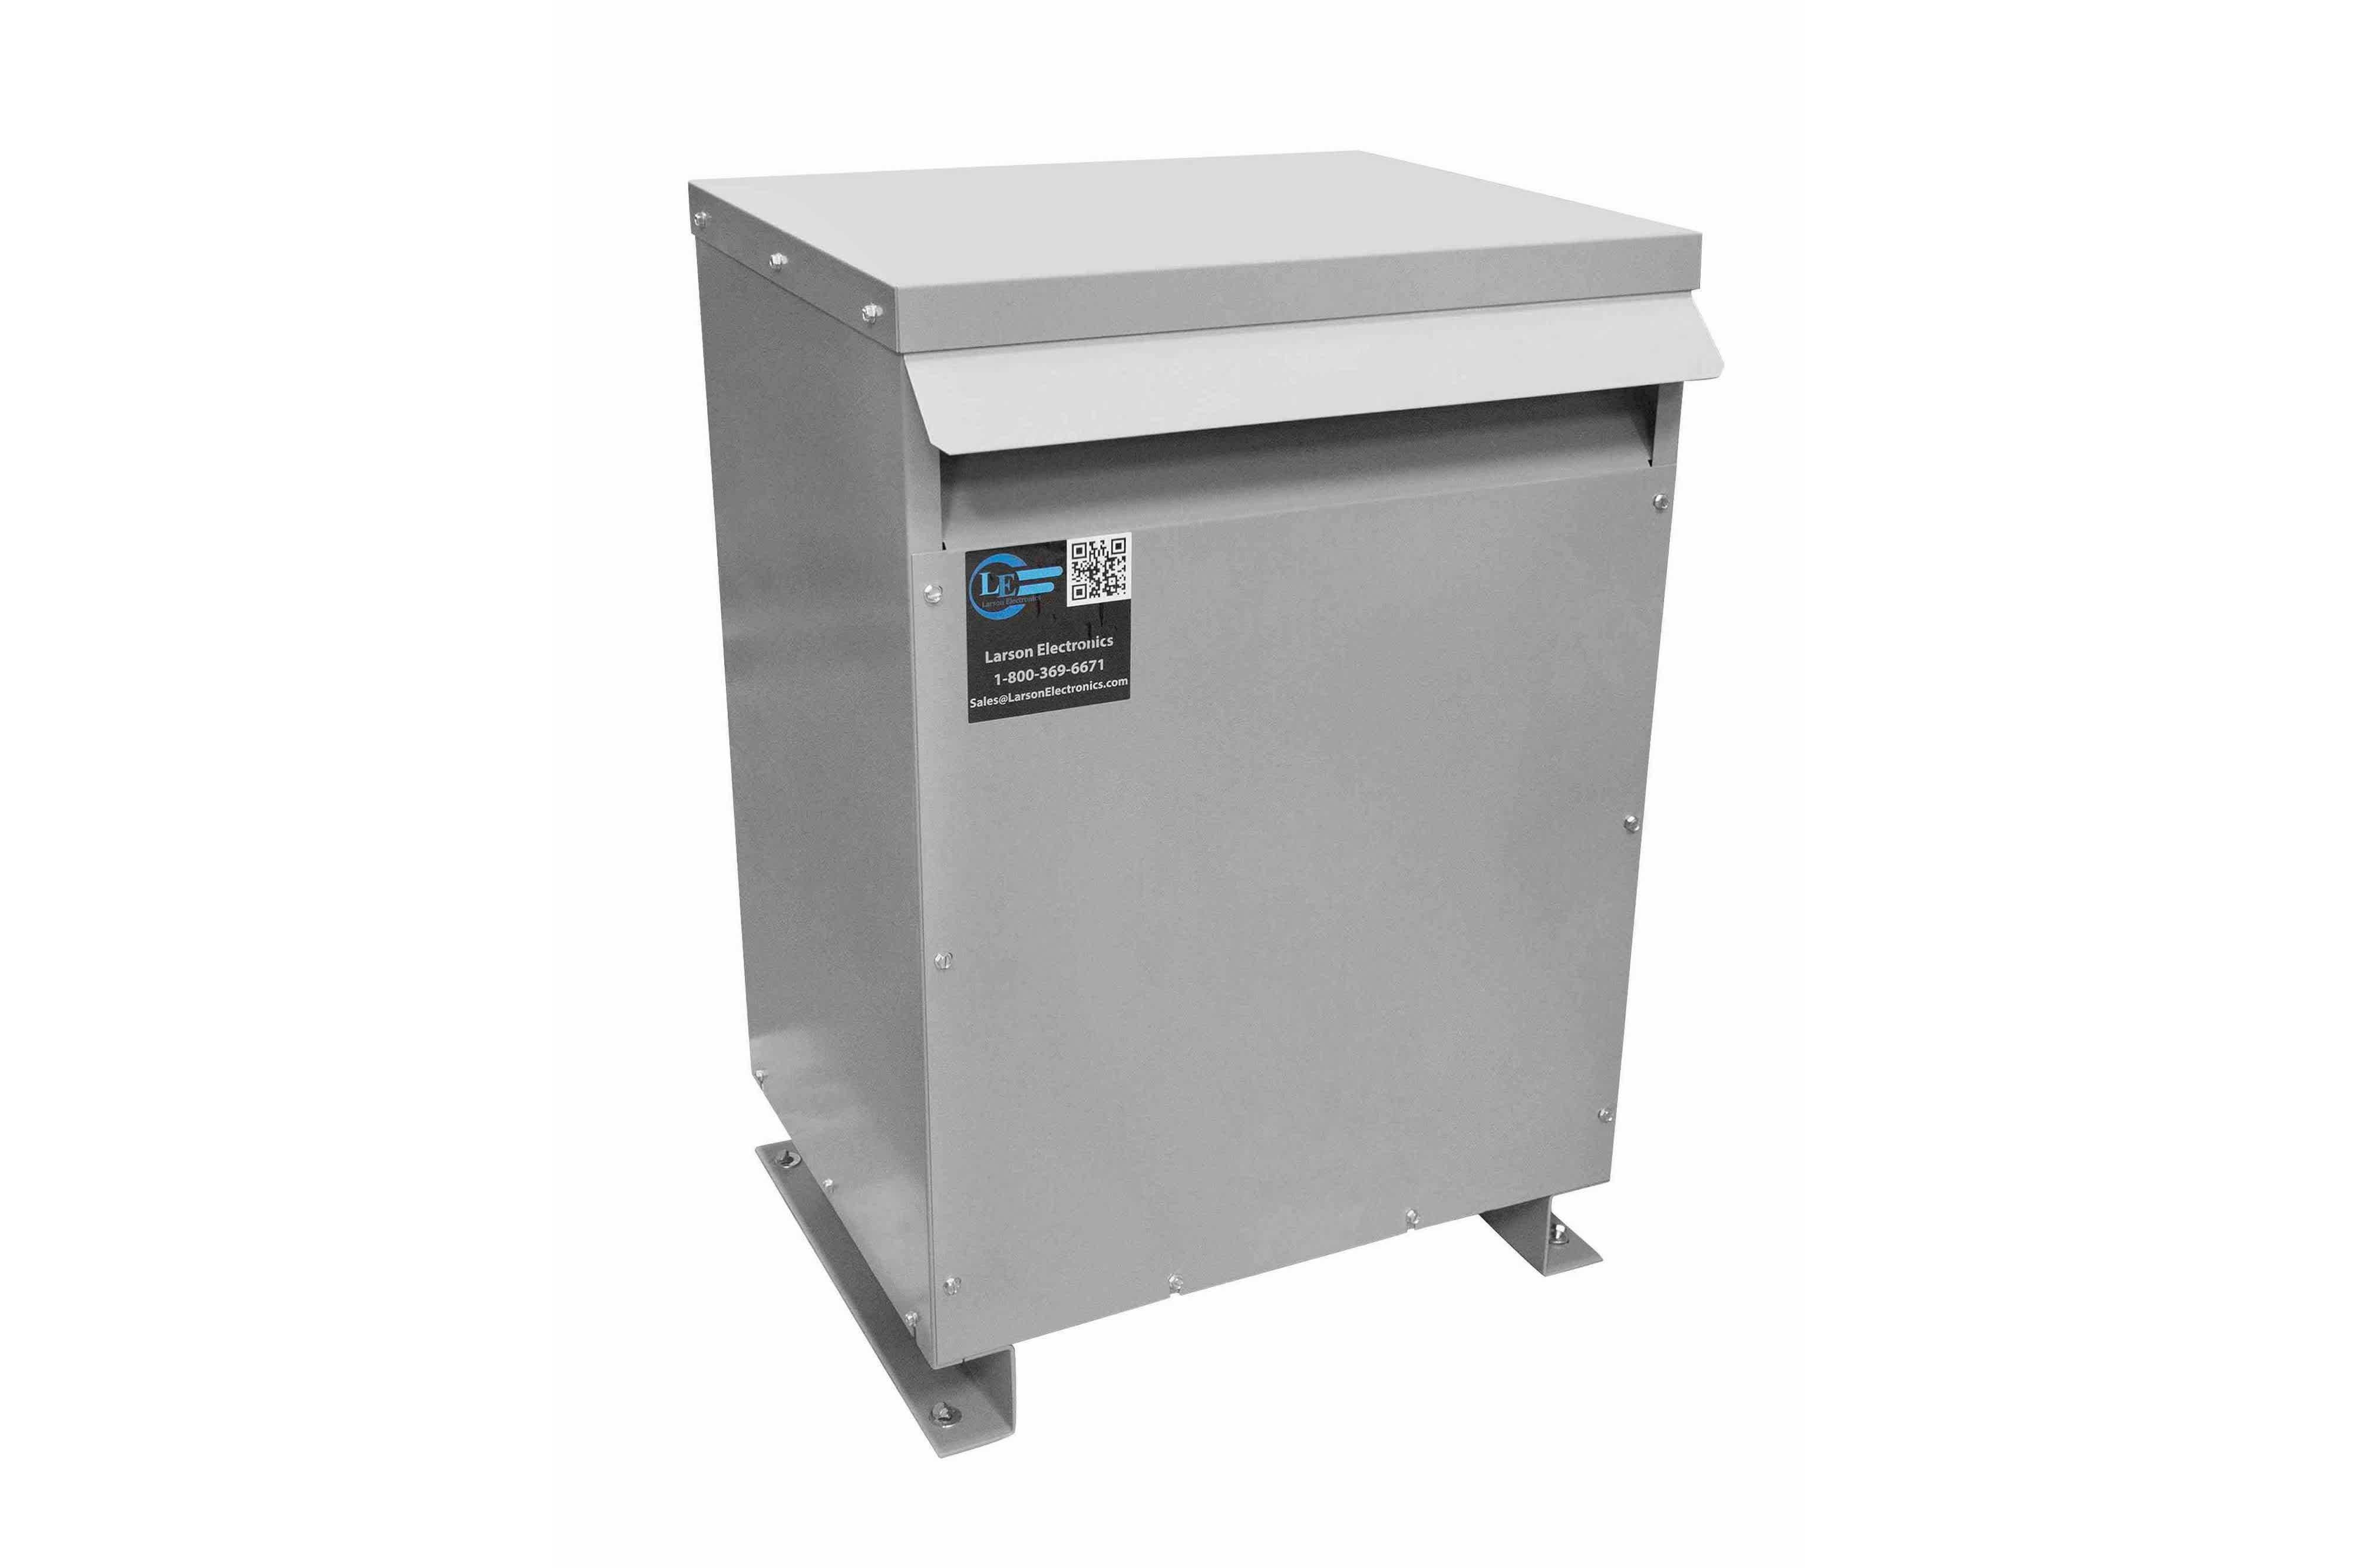 700 kVA 3PH Isolation Transformer, 240V Wye Primary, 380V Delta Secondary, N3R, Ventilated, 60 Hz